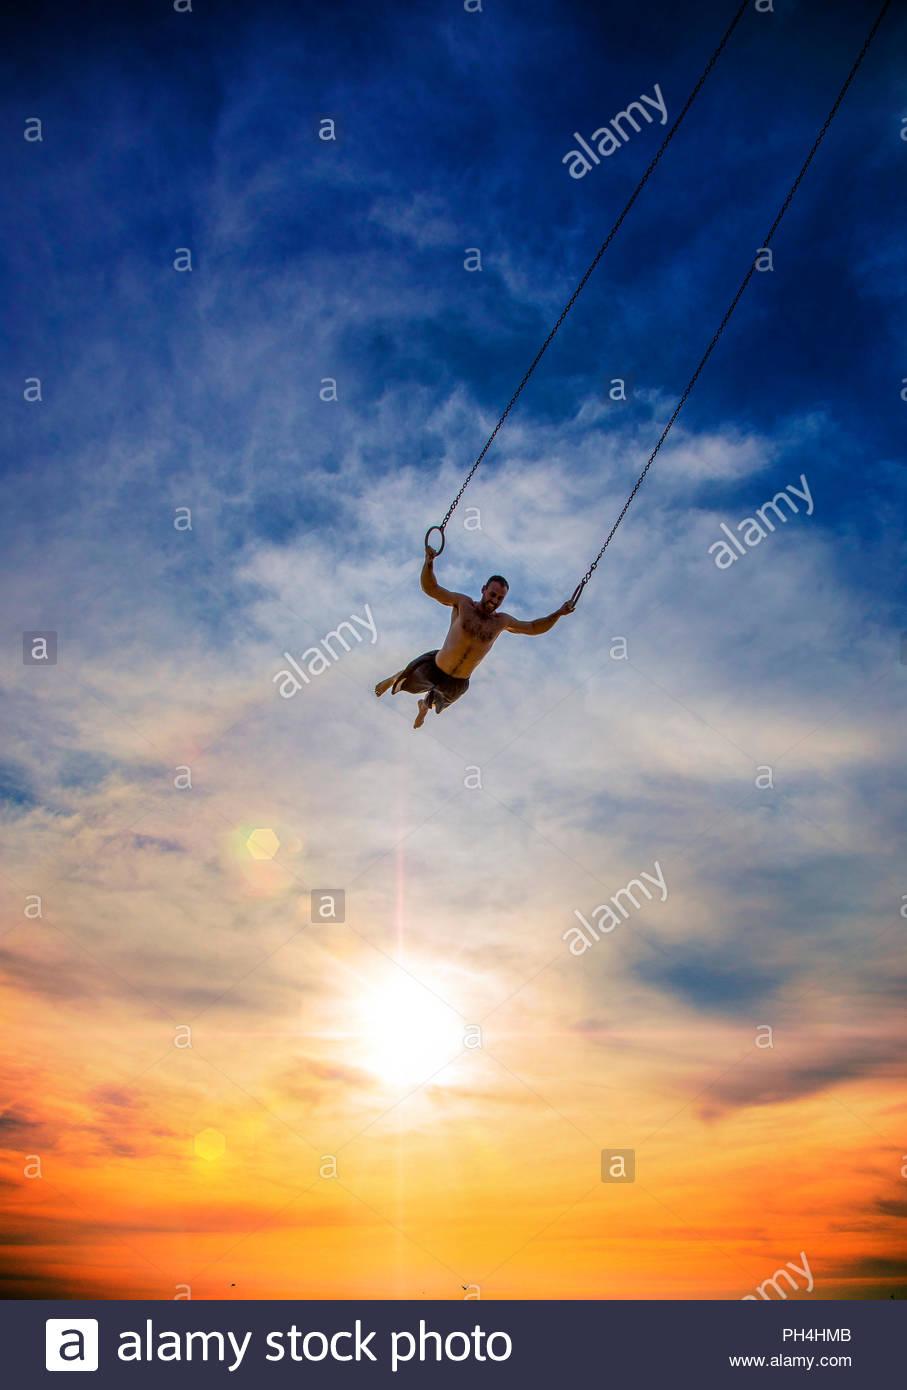 Man swinging on gymnastic rings during sunset - Stock Image